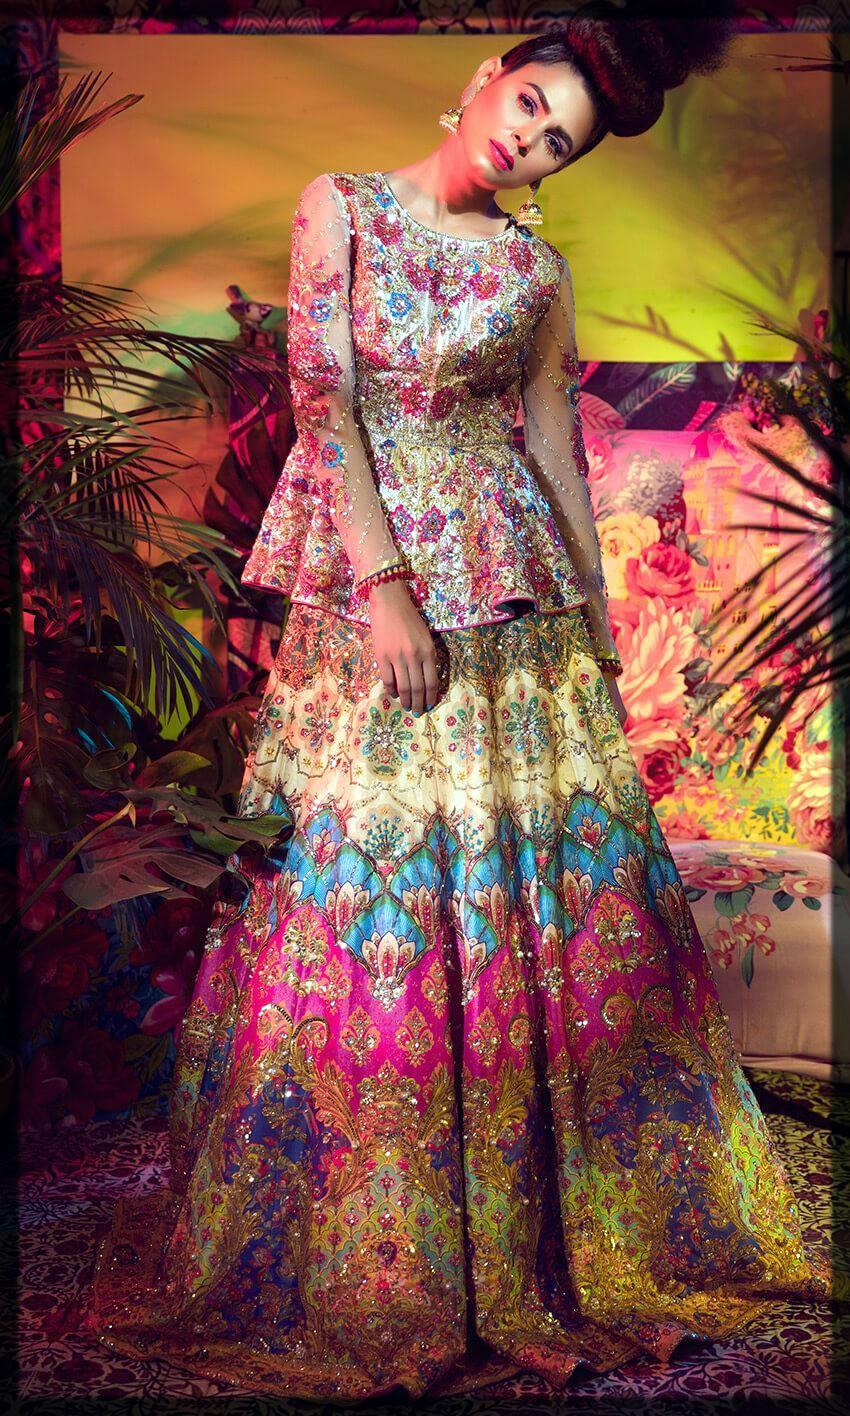 lavish mehndi dress for bride to be